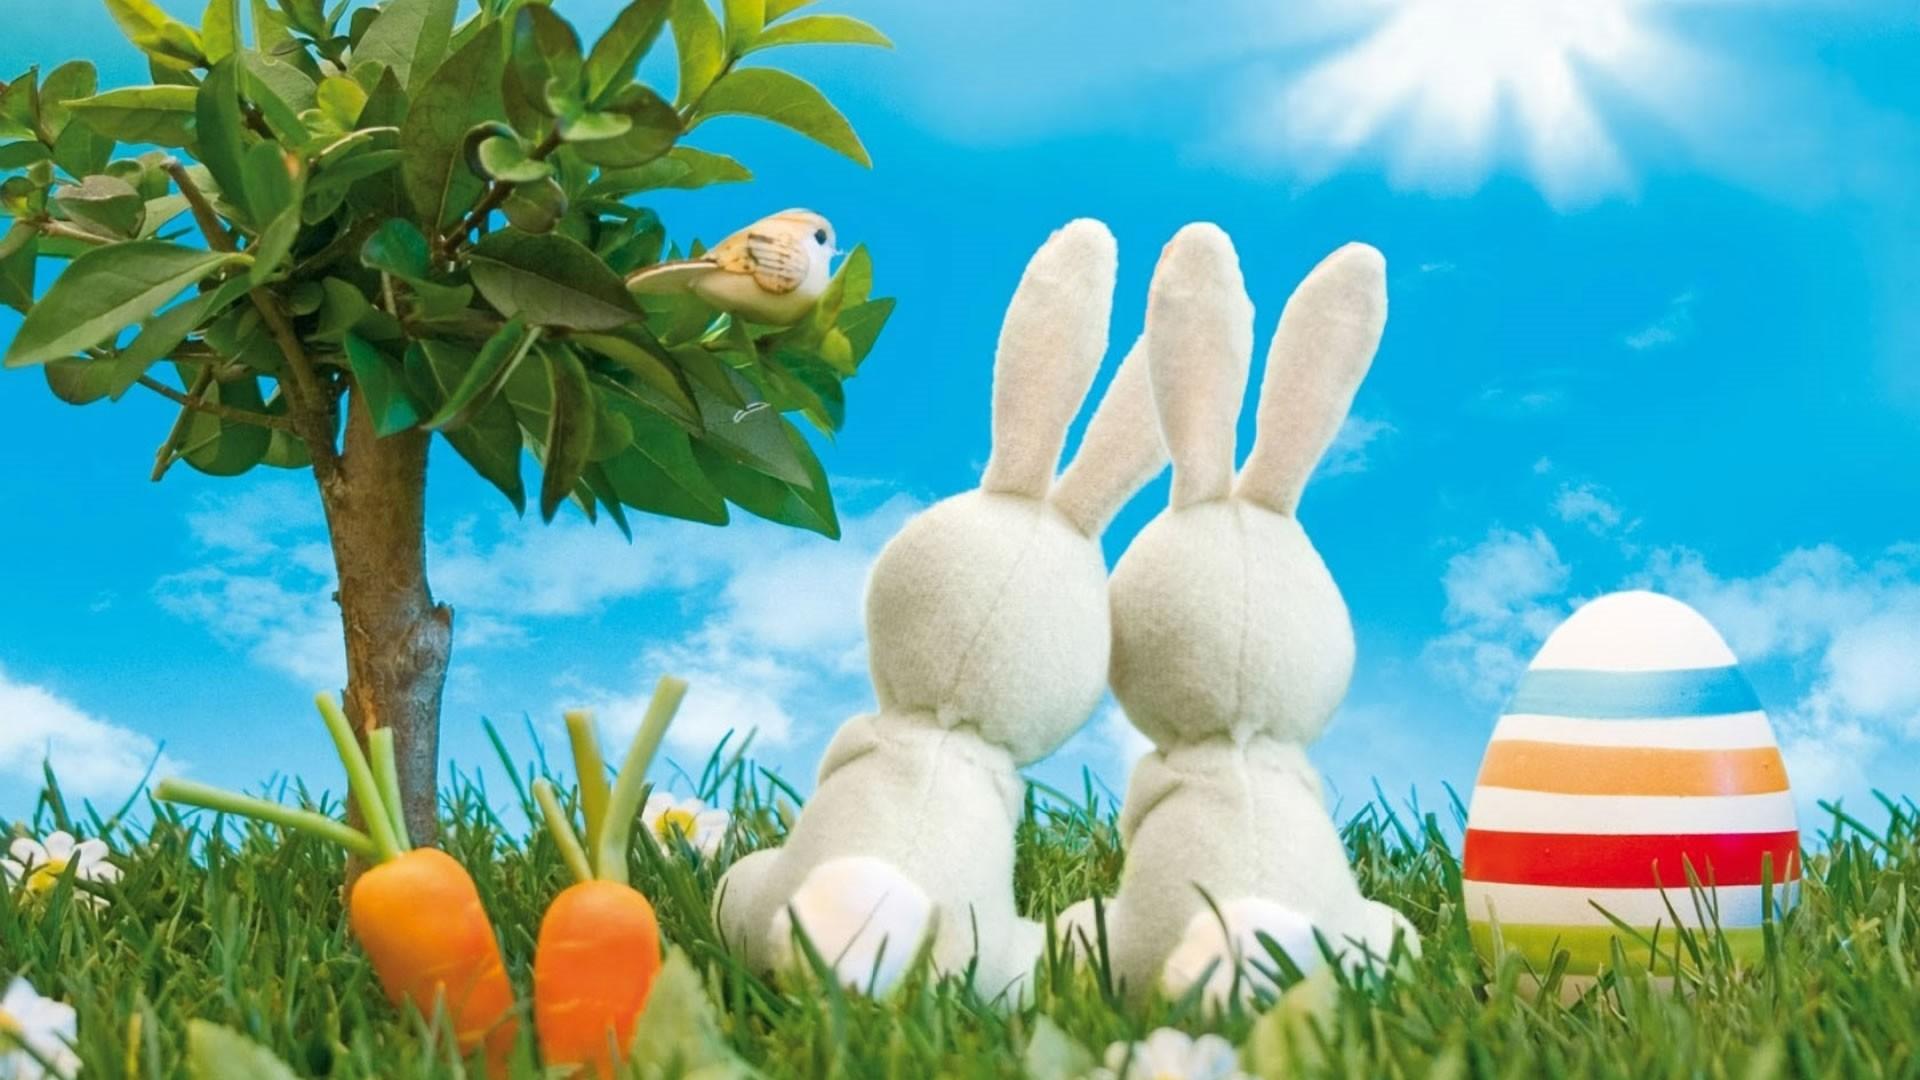 Cute Easter Wallpaper Free